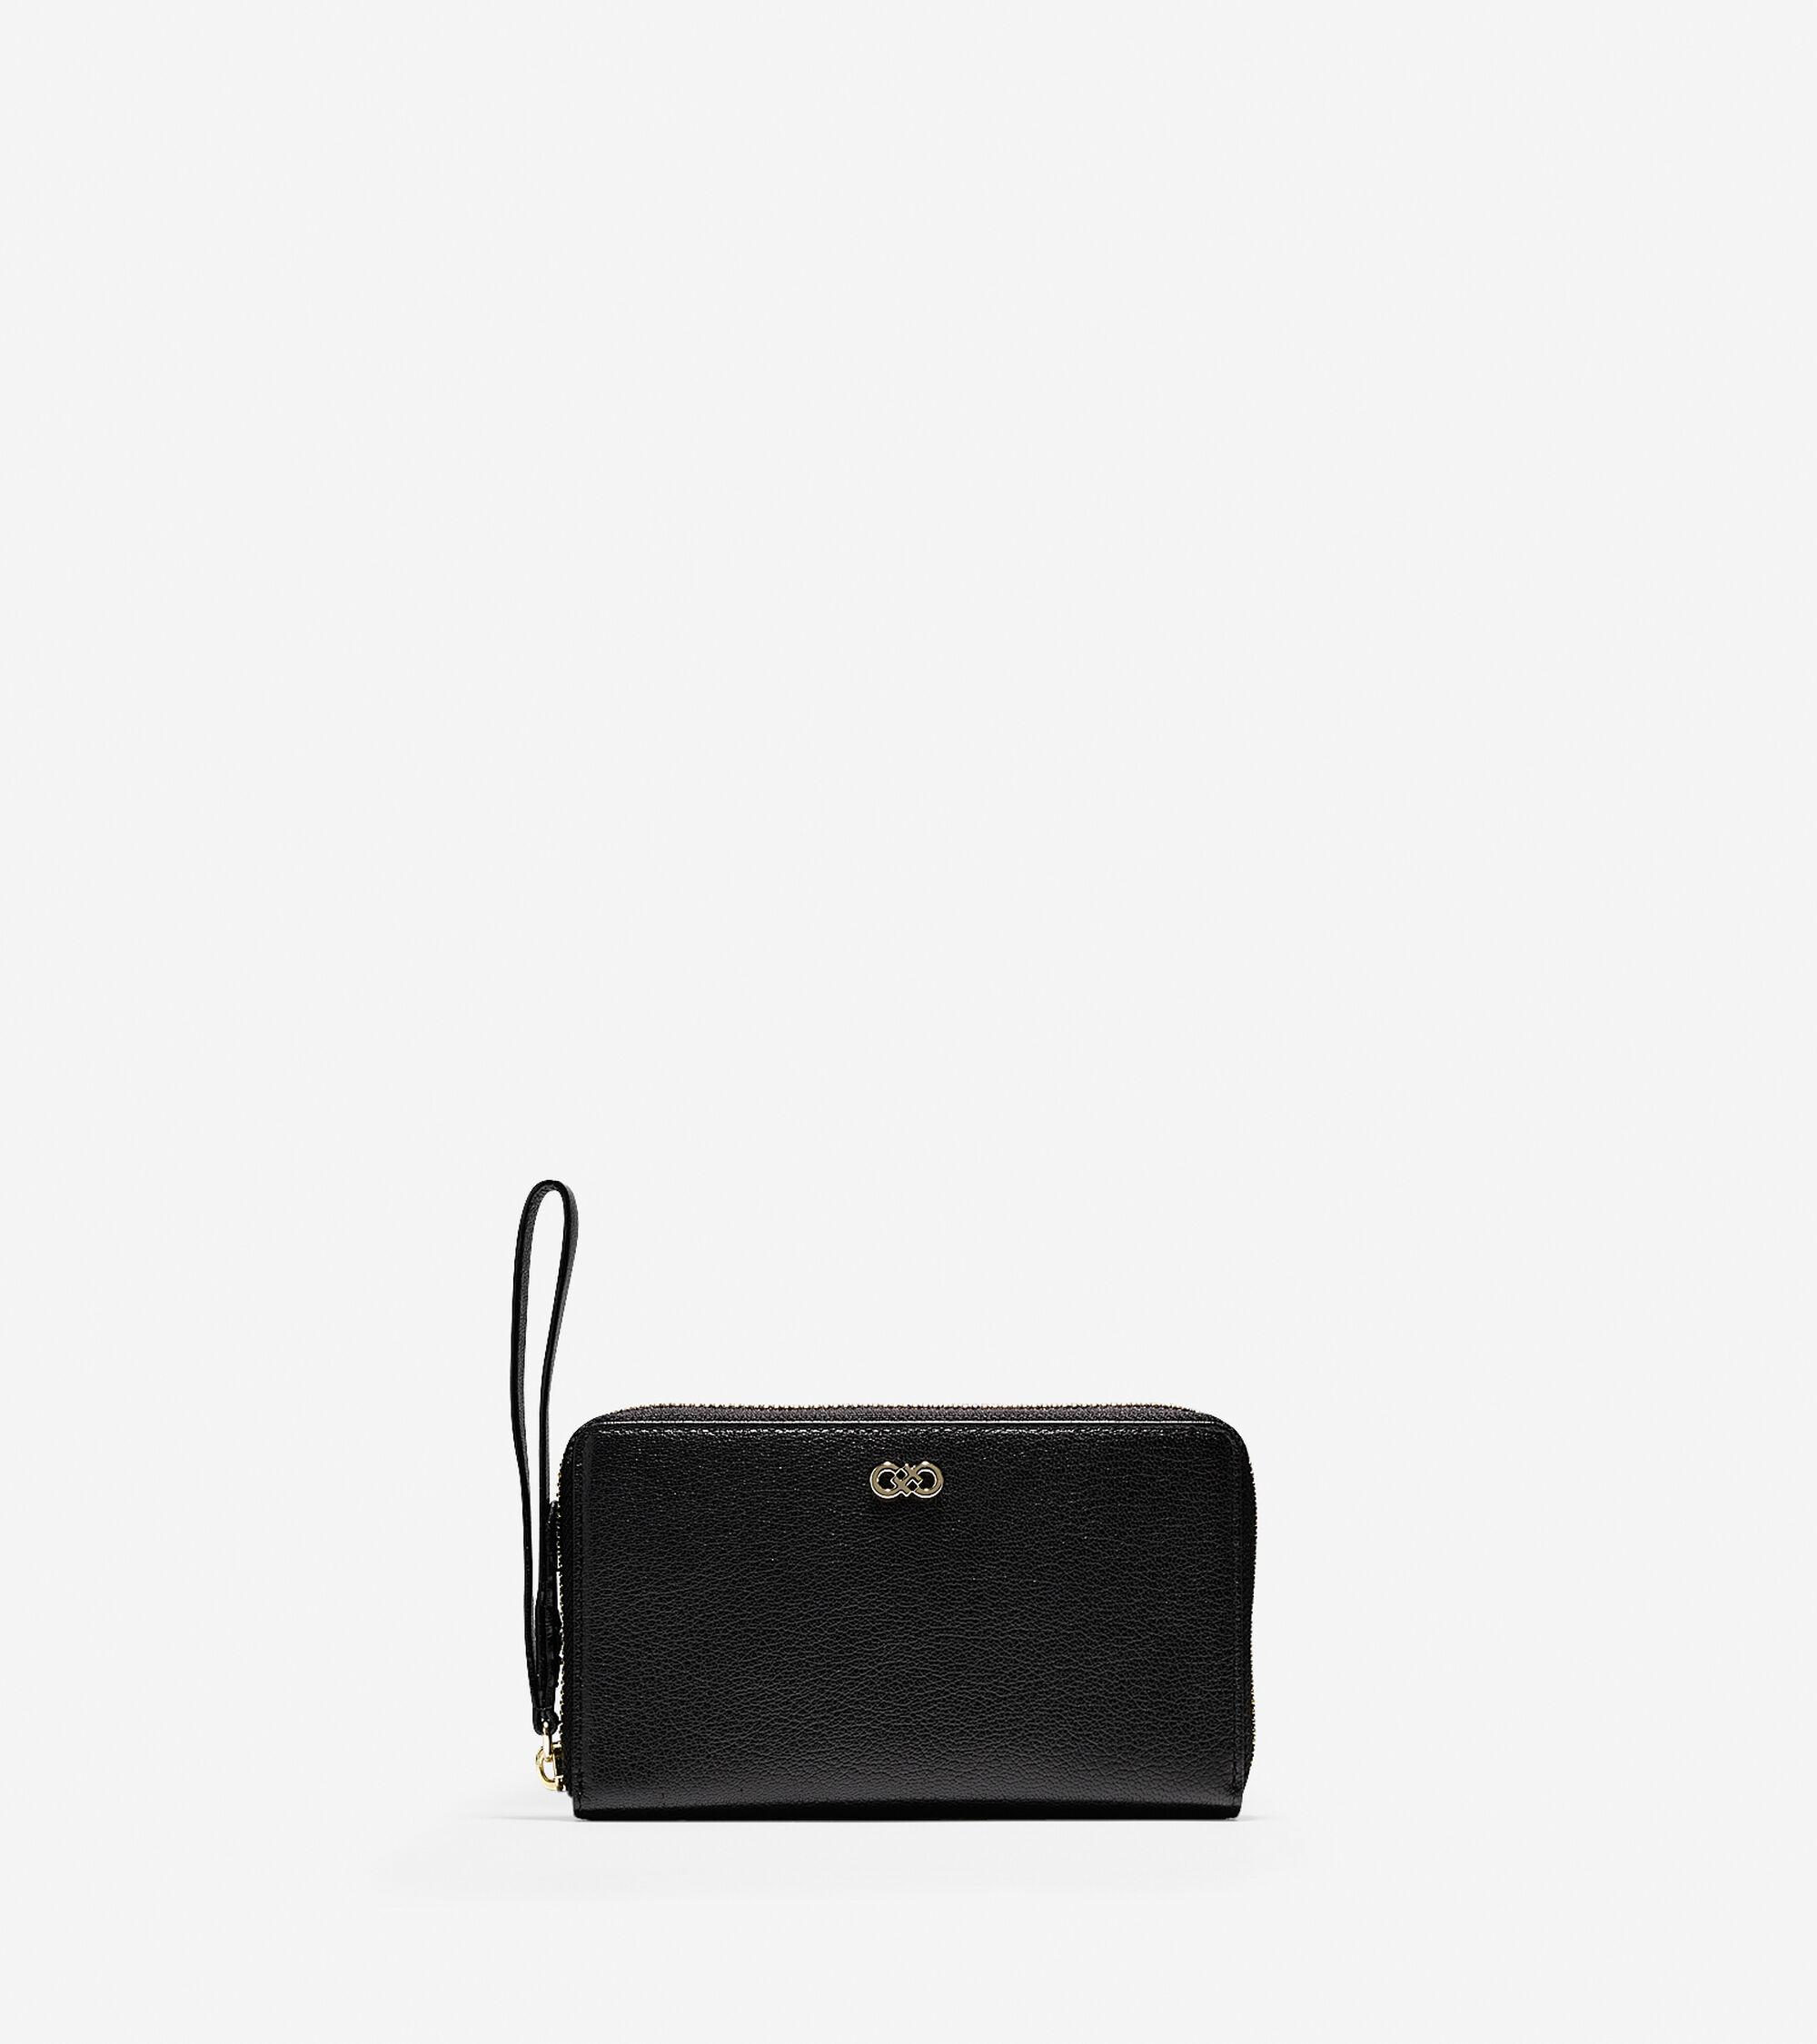 Accessories > Reddington Smart Phone Wallet